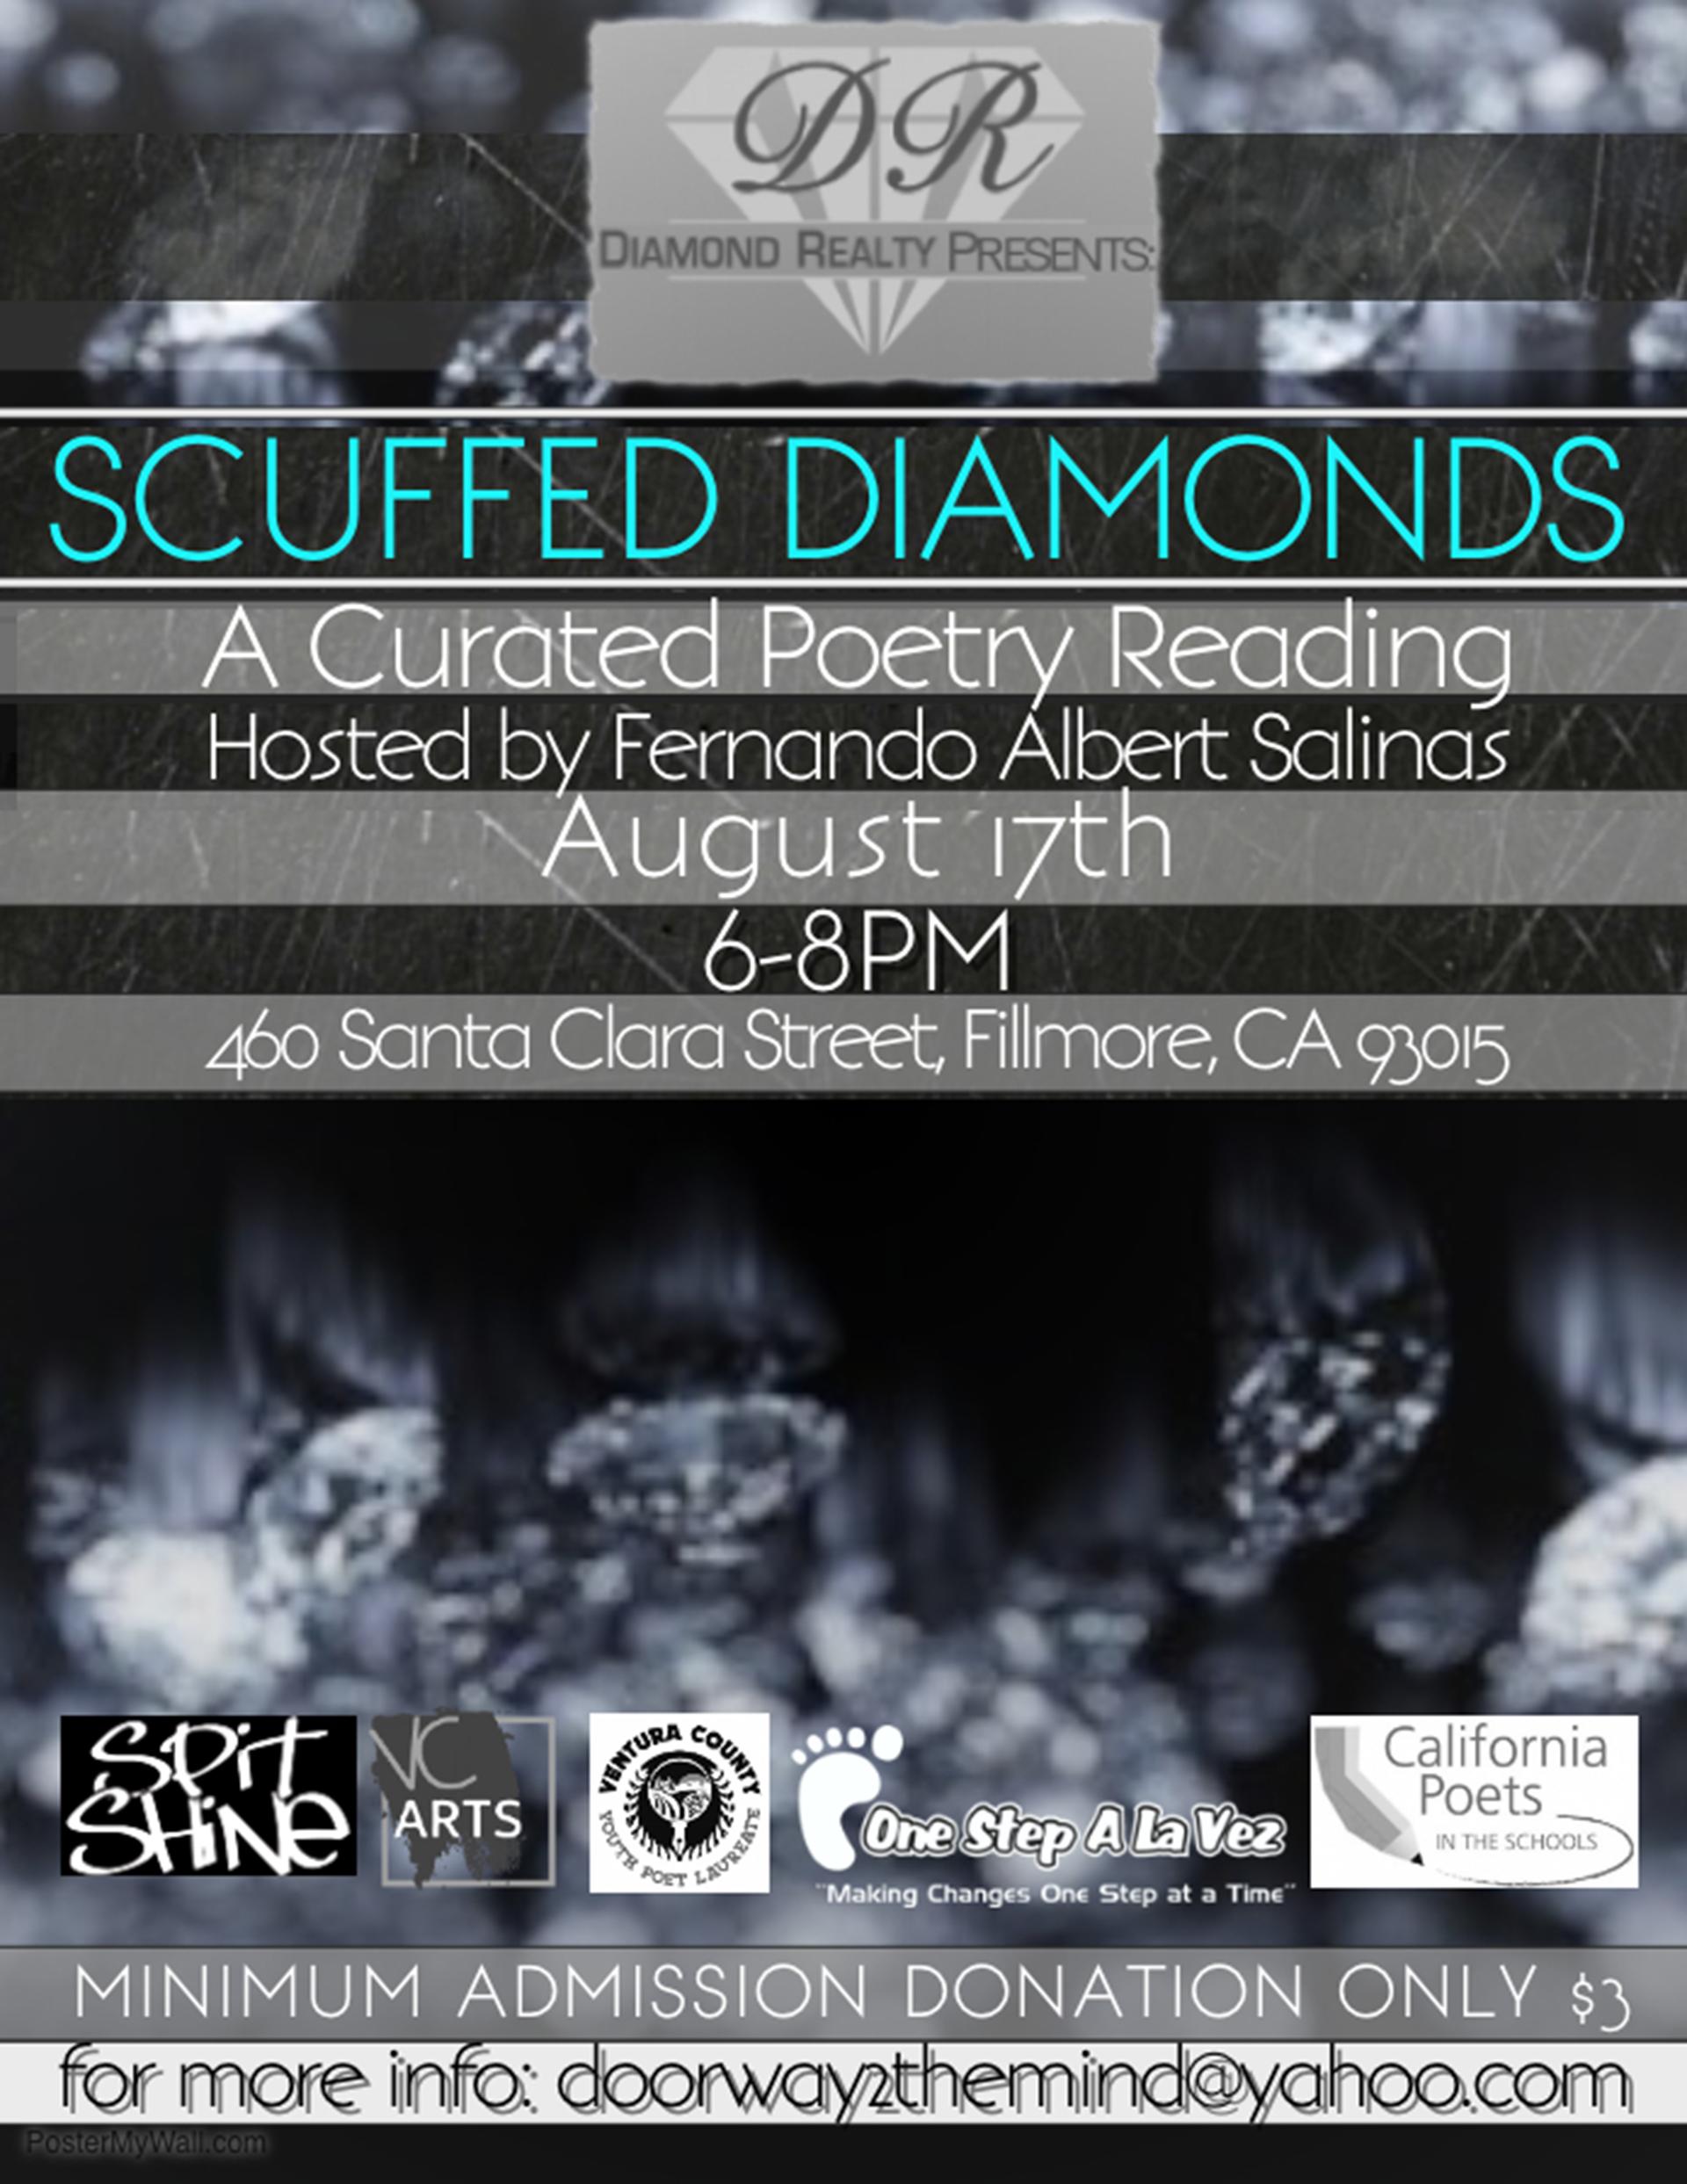 Scuffed-Diamonds-Poetry-Reading.jpg